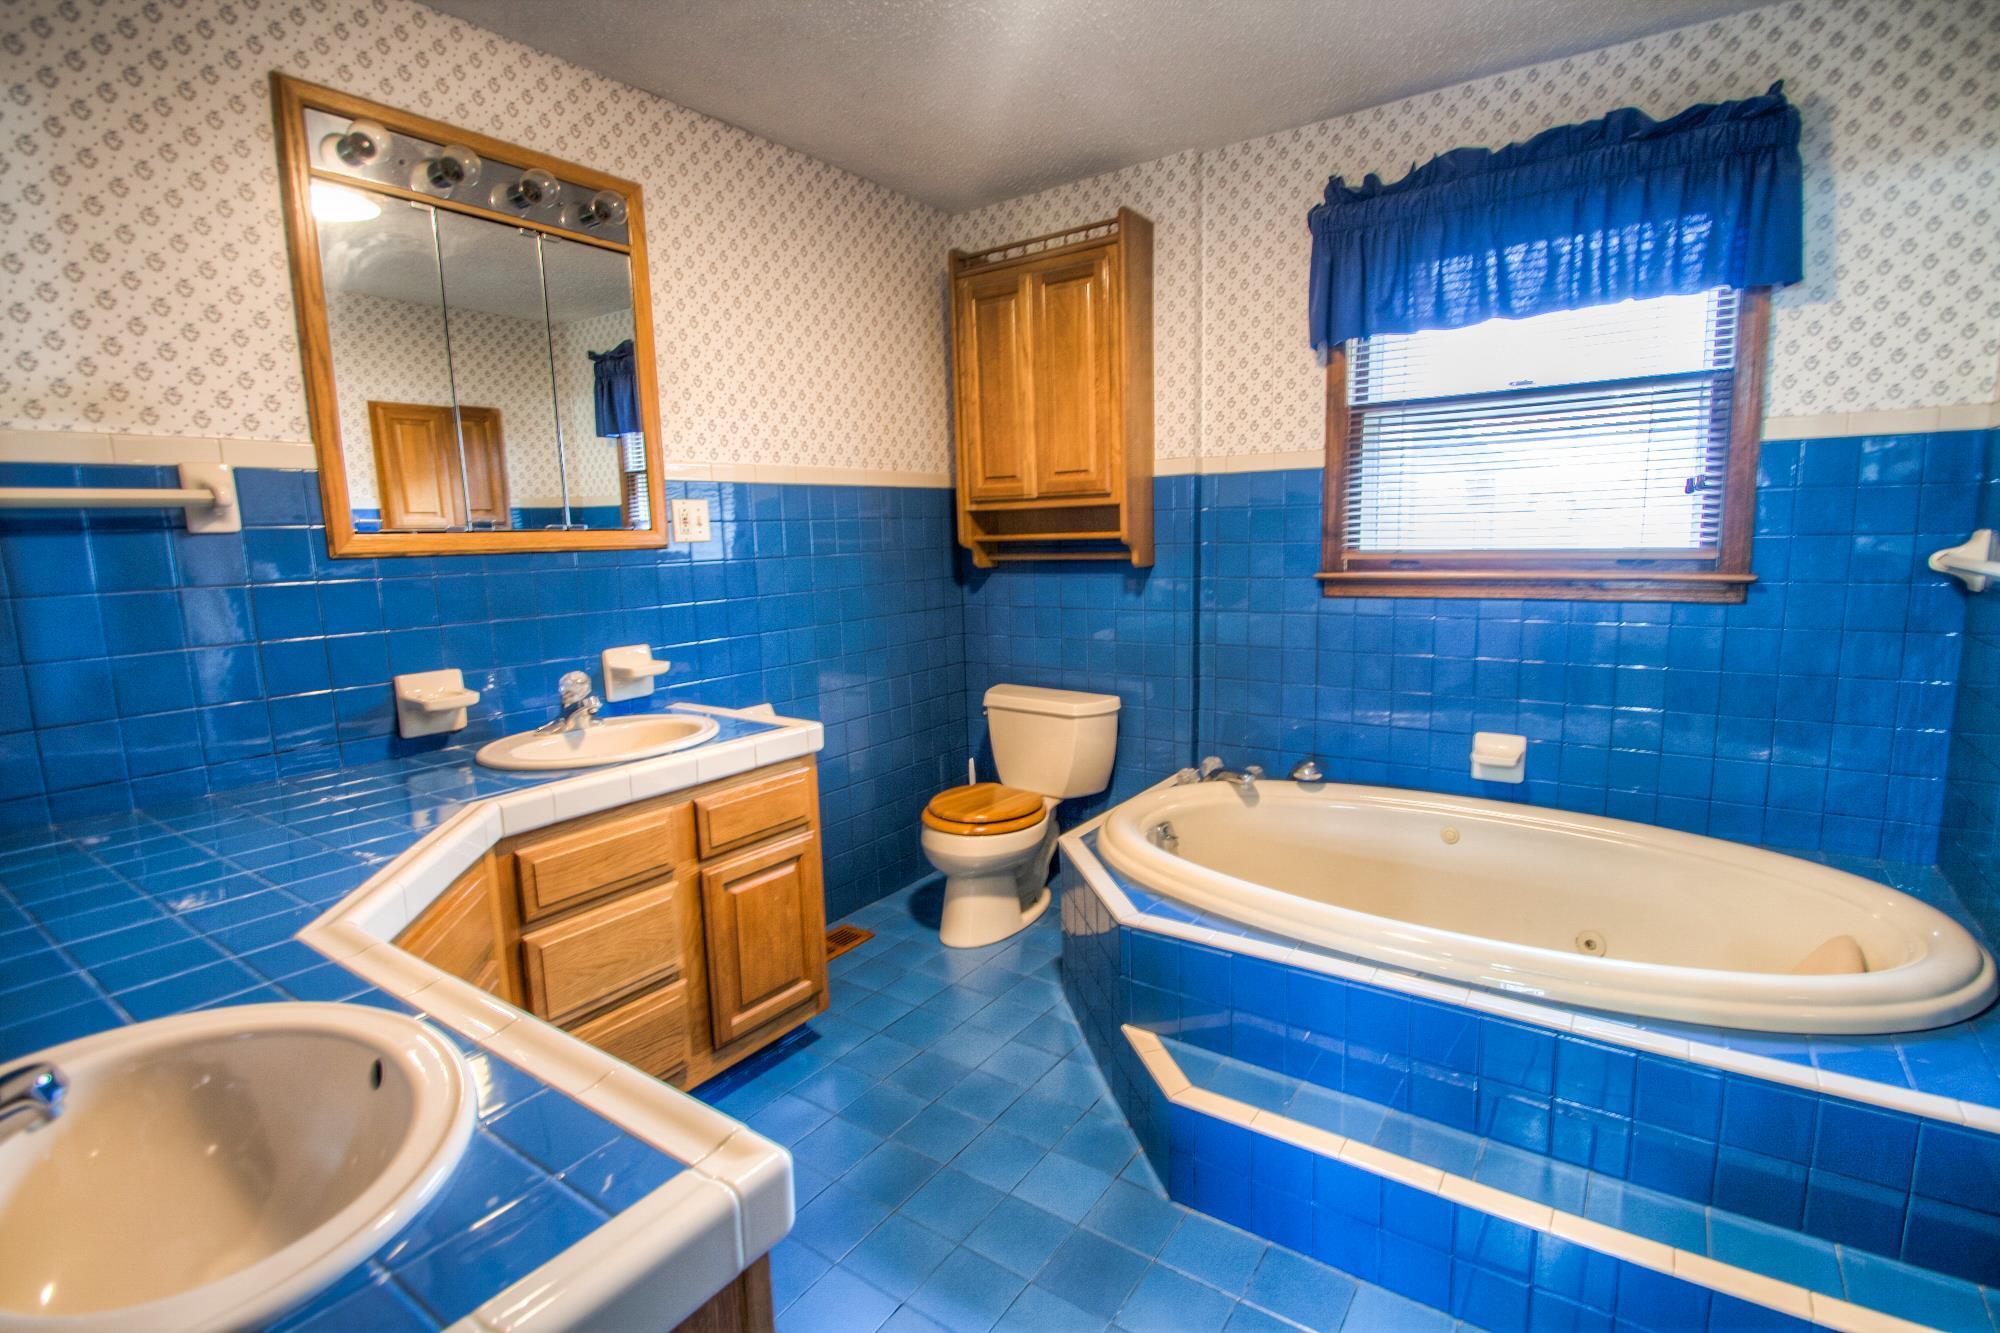 Bathroom Fixtures Nashville Tn 4912 packard dr, nashville, tn 37211 mls# 1792777 - movoto